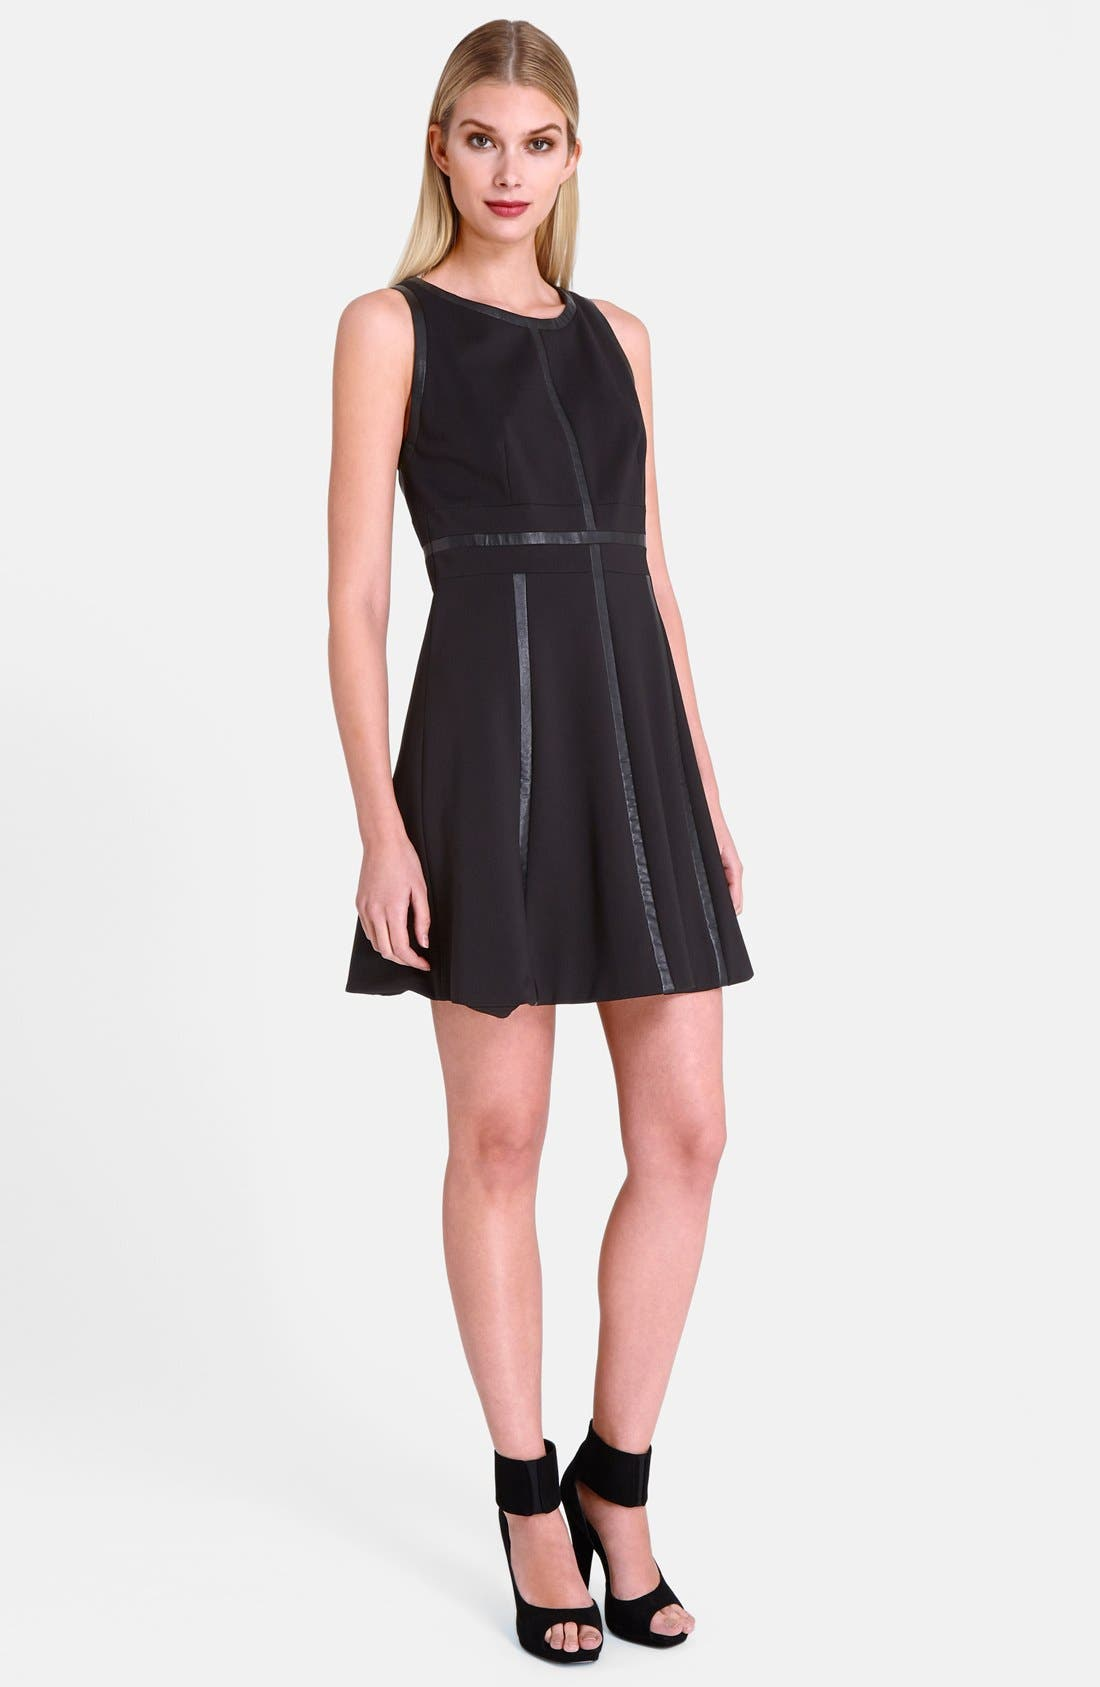 Alternate Image 1 Selected - Catherine Catherine Malandrino 'Lori' Faux Leather Trim Dress